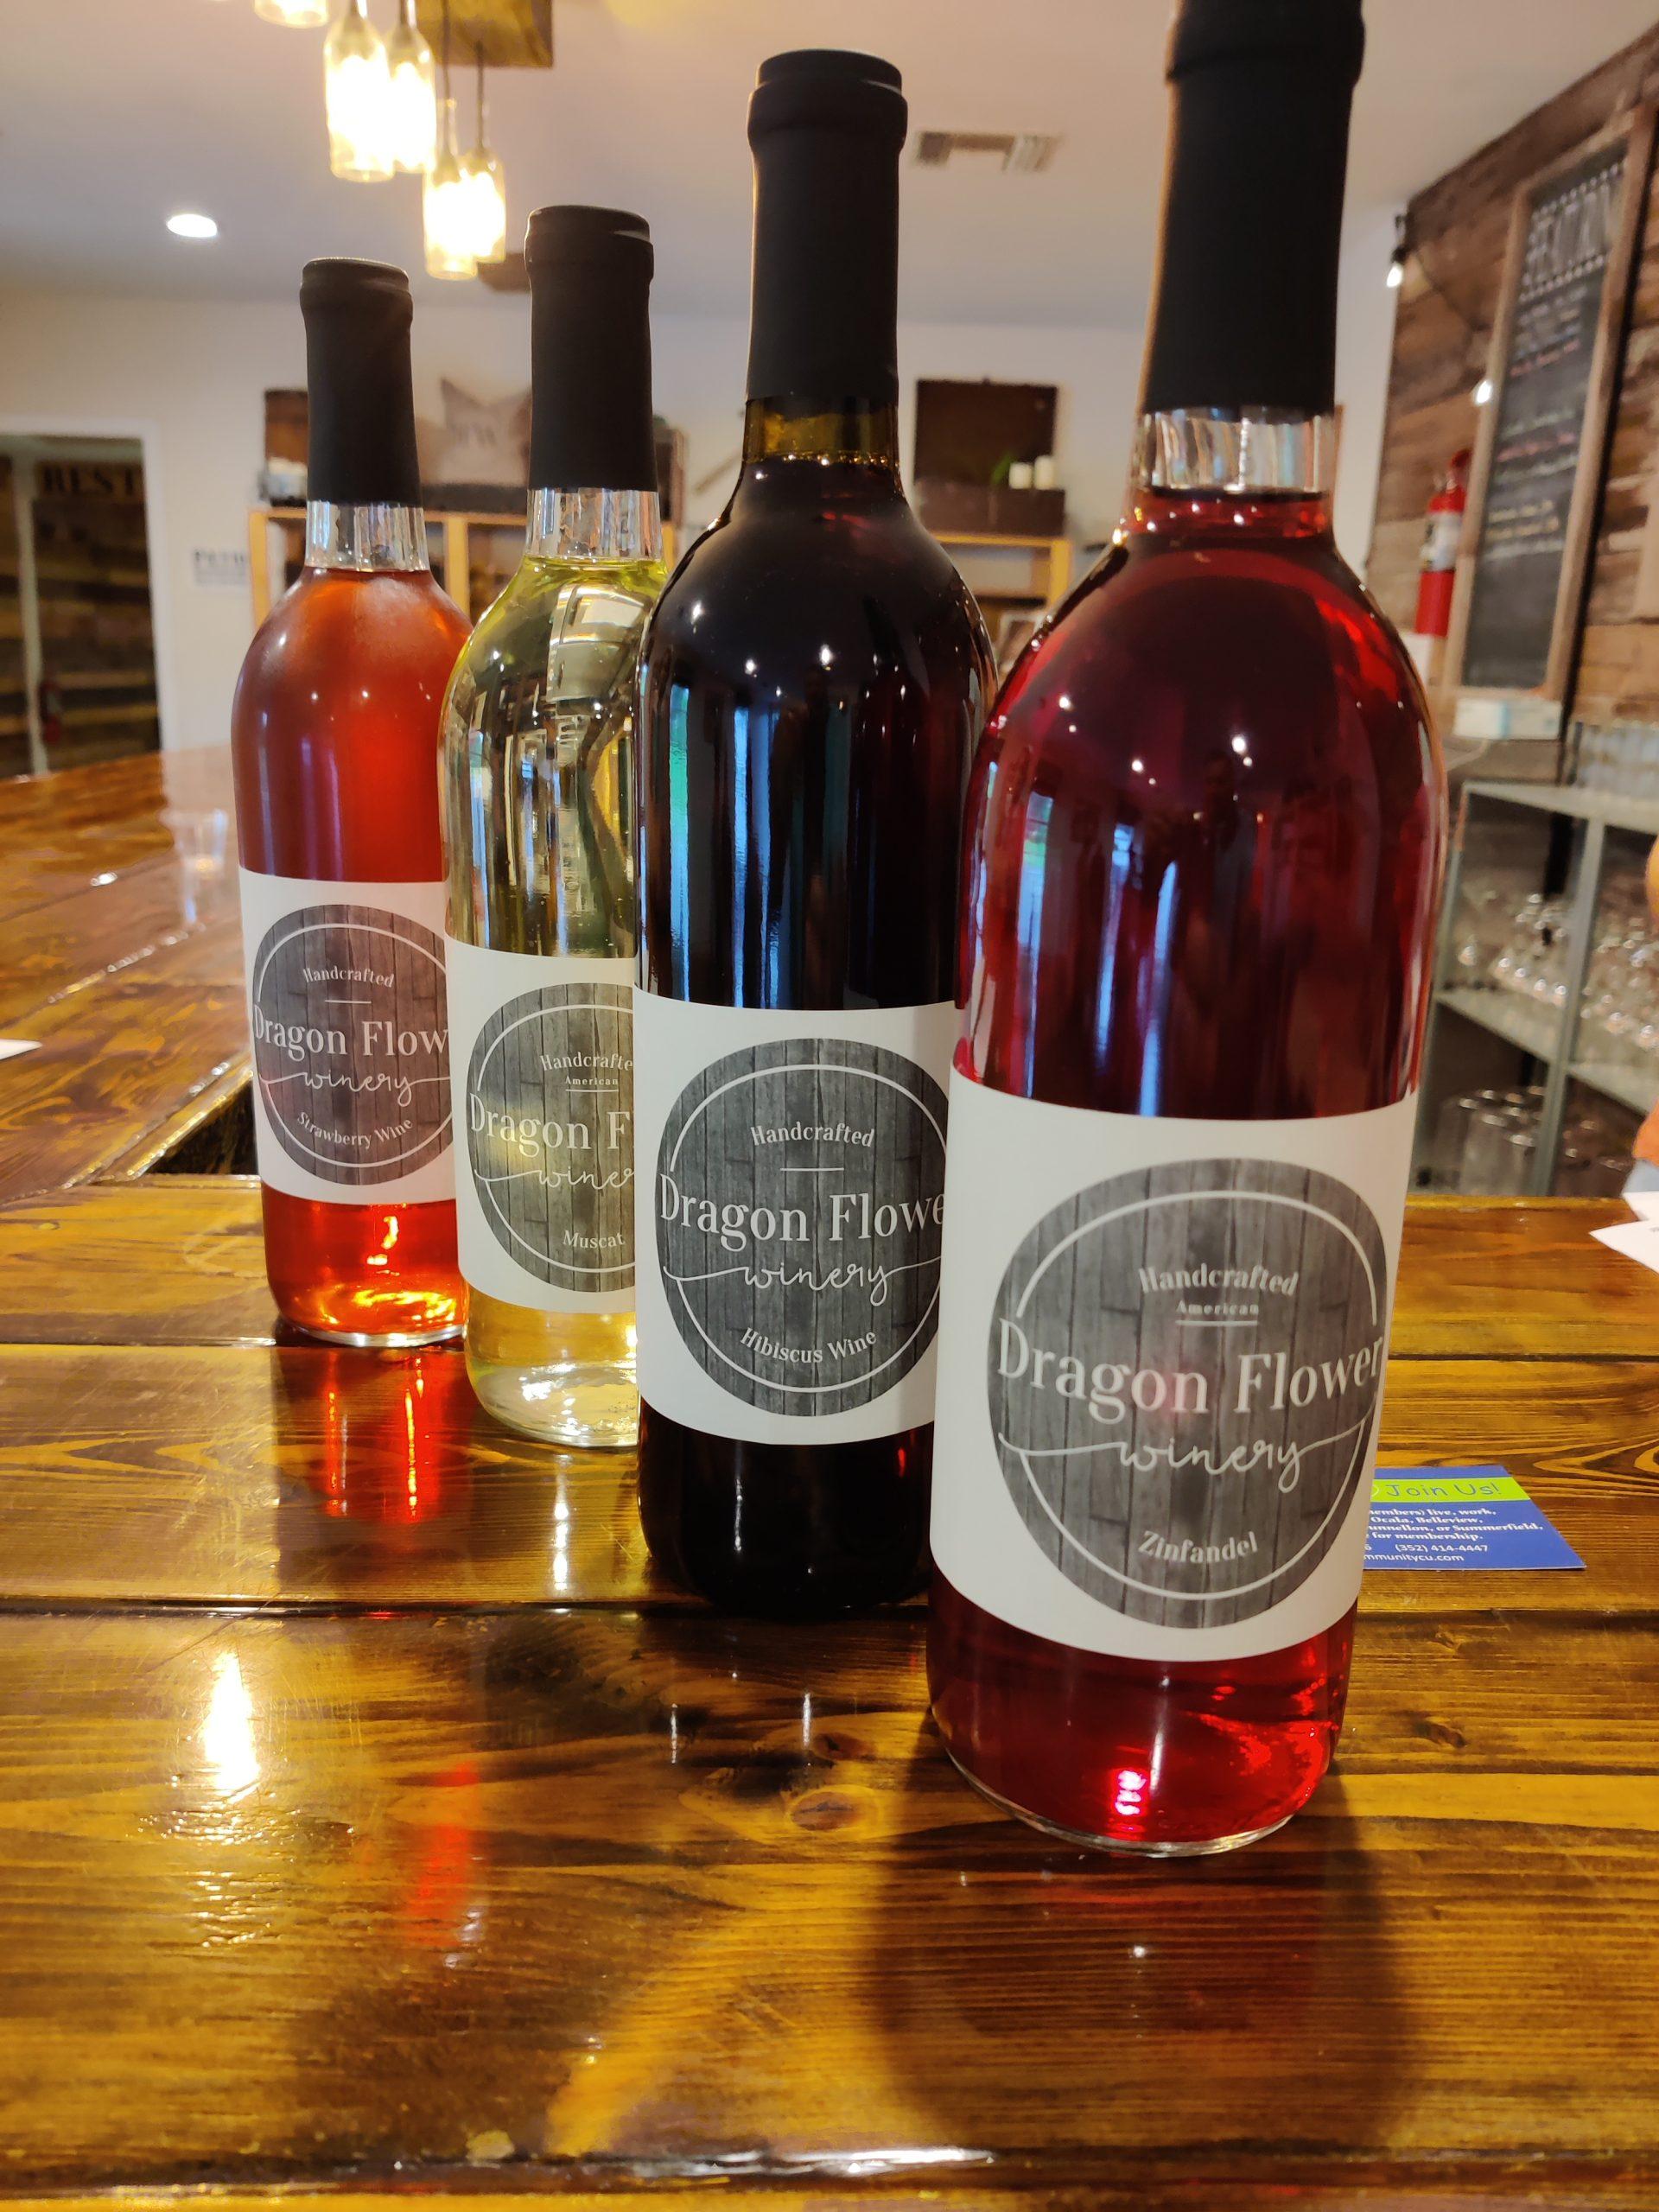 Dragon Flower Winery